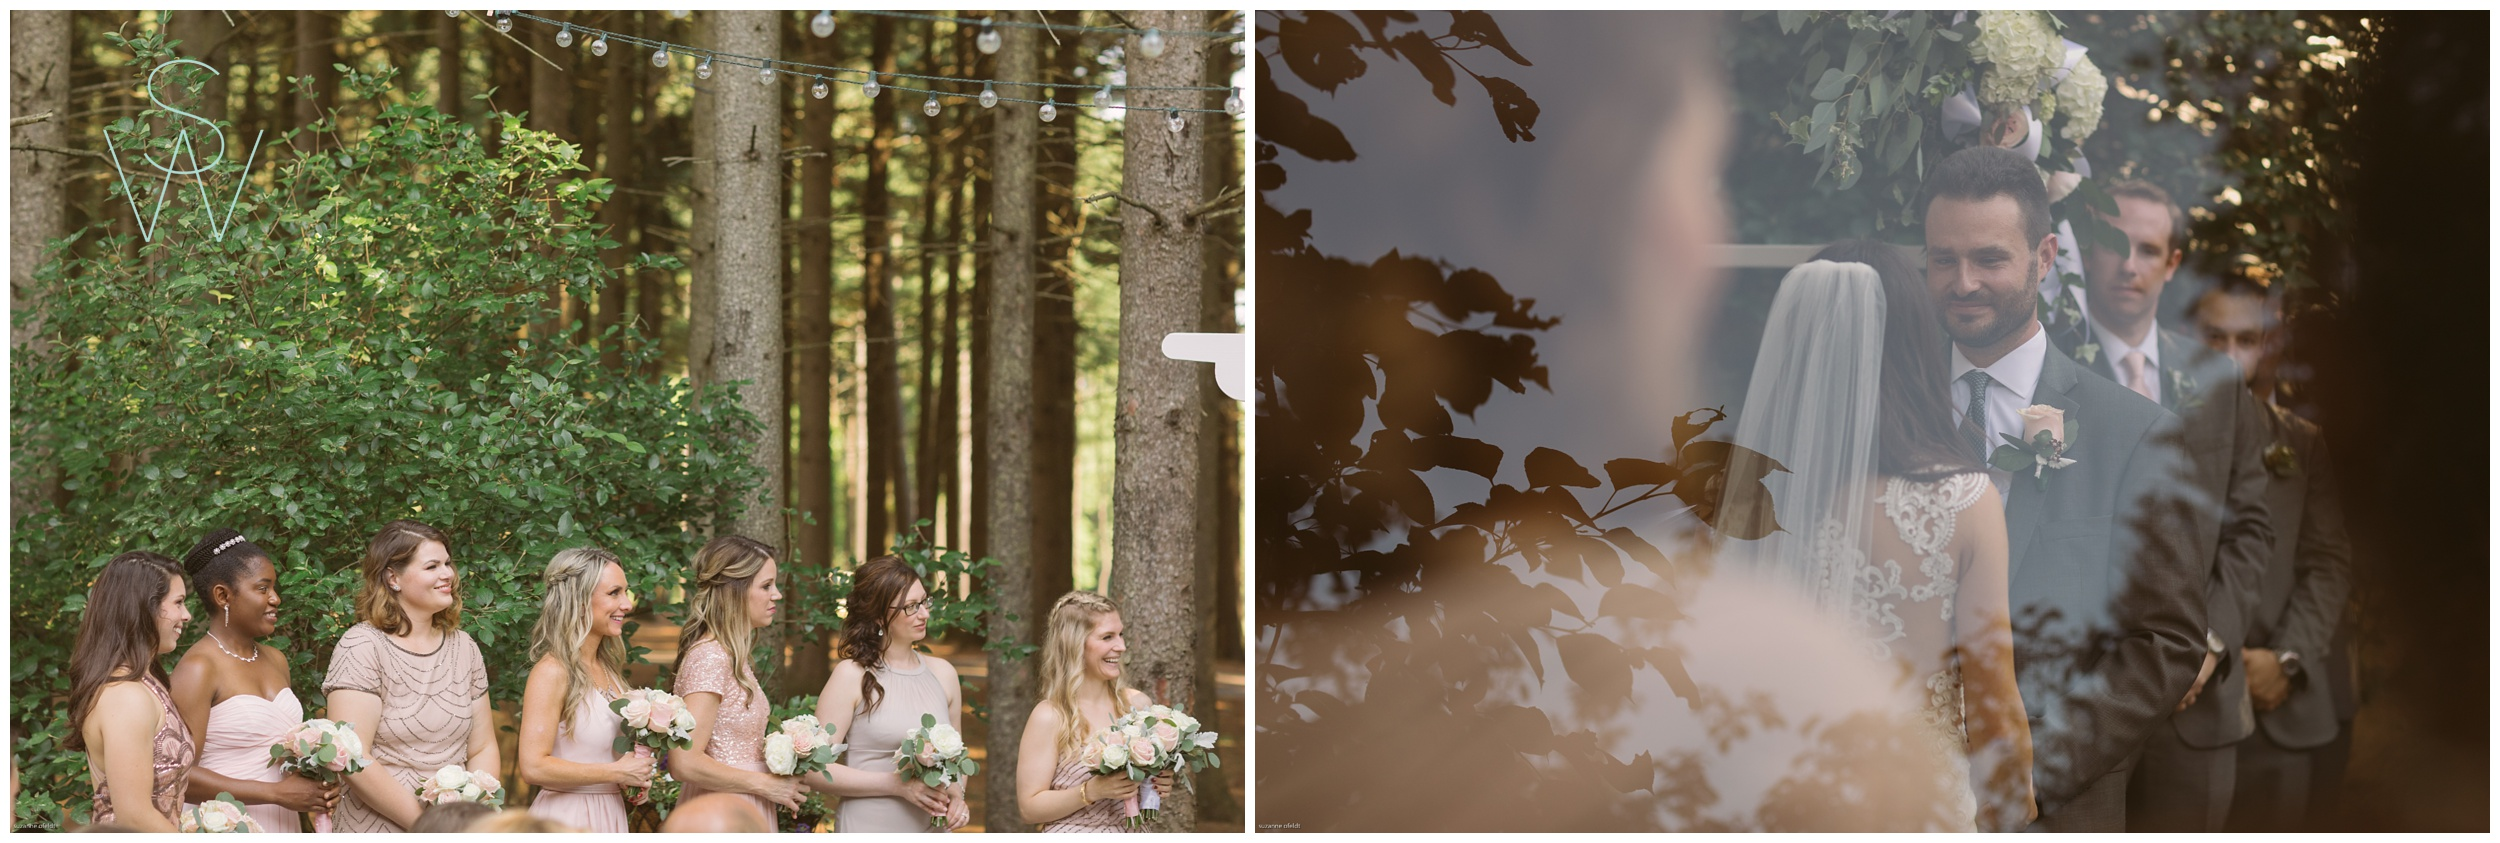 san.diego.wedding.photography_0155.jpg